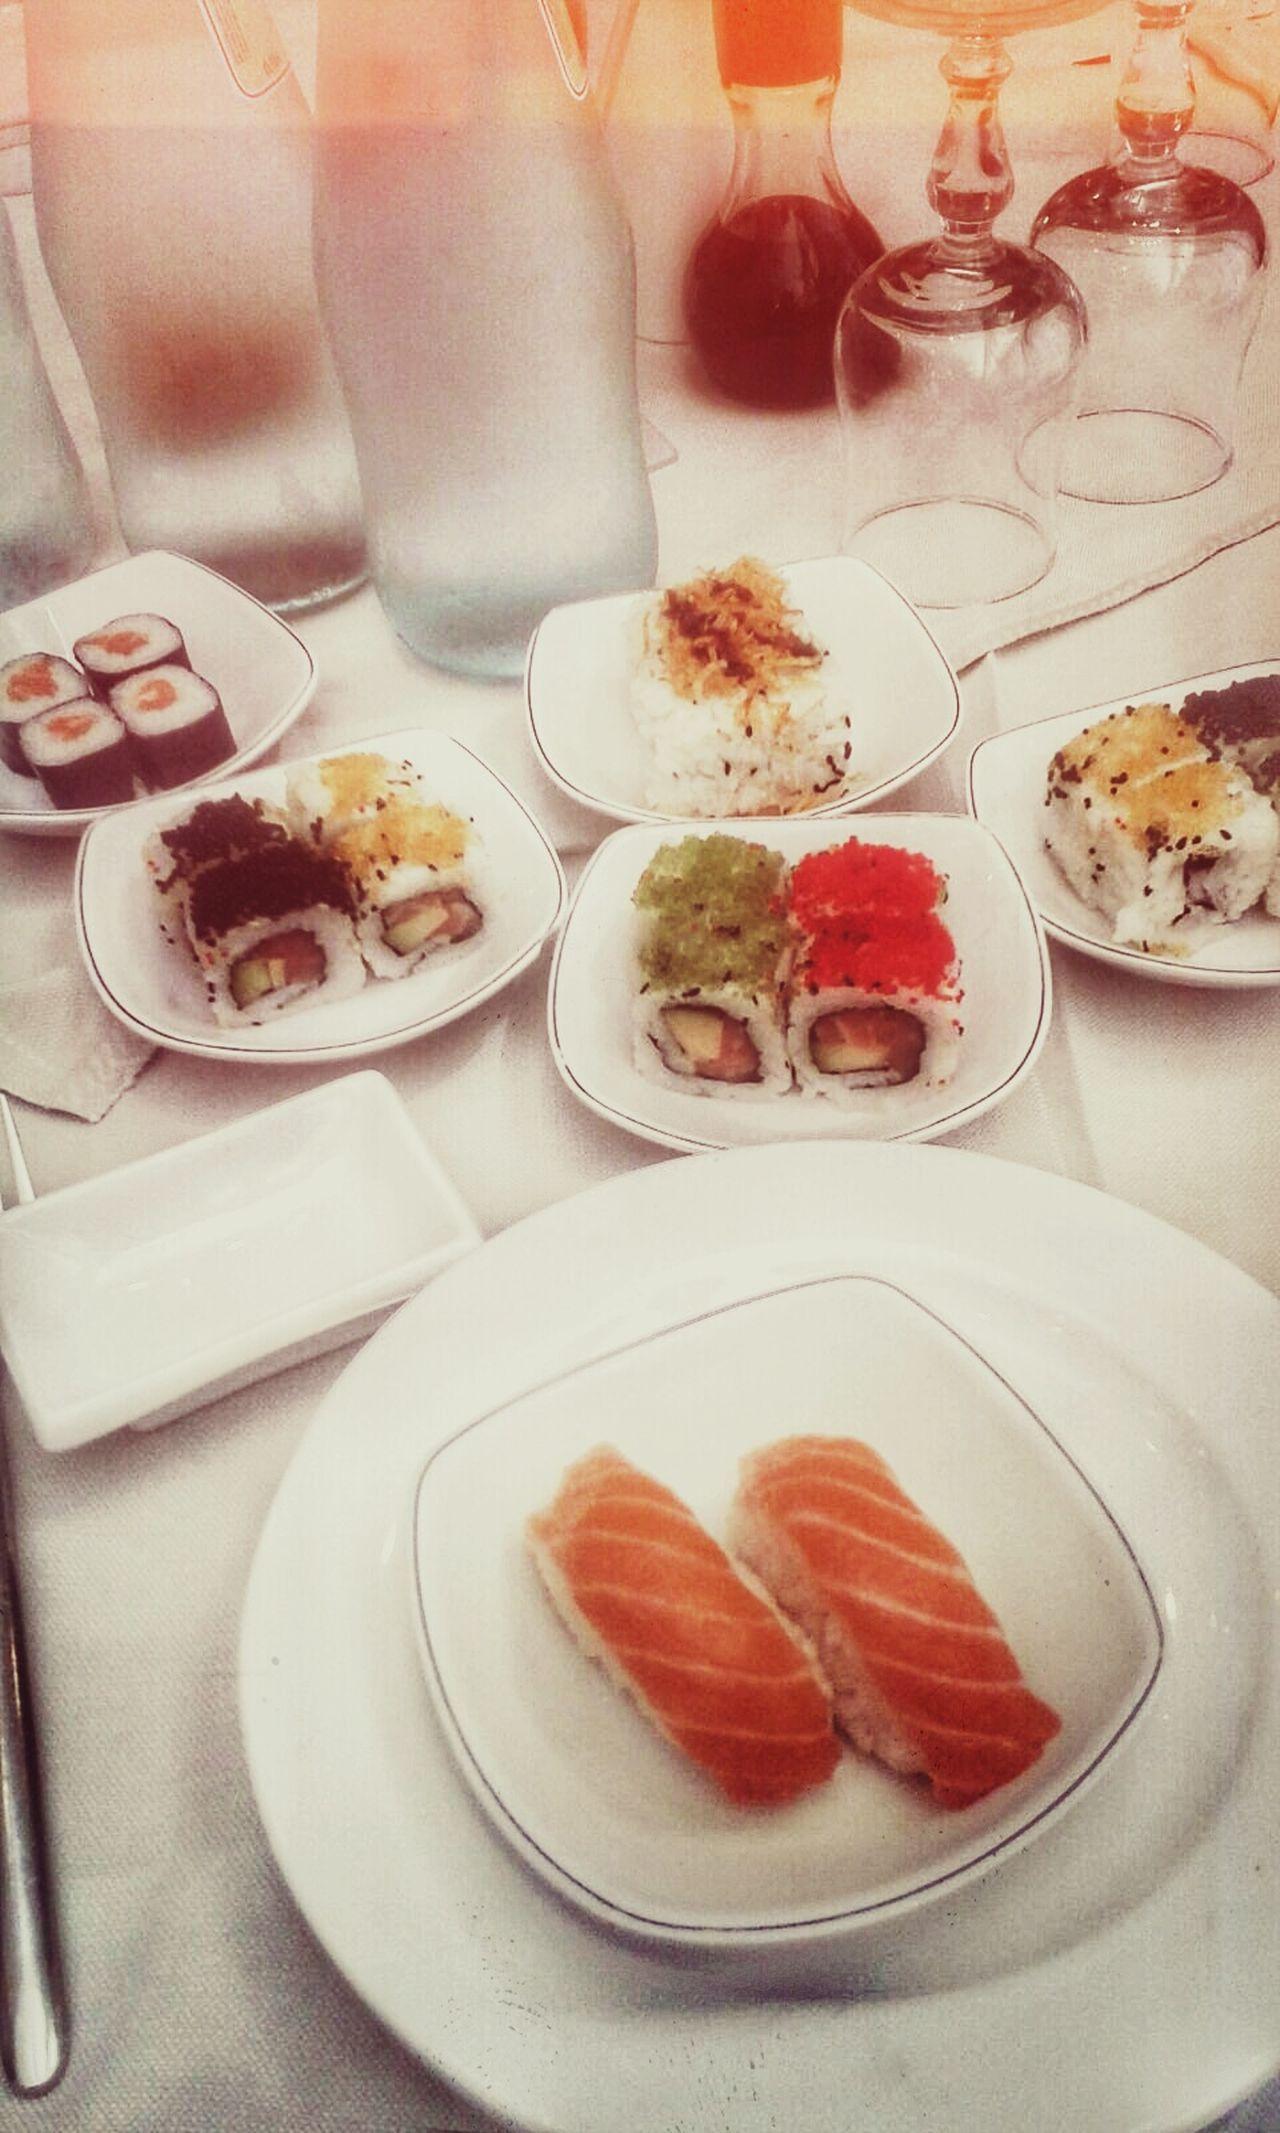 Sushi Restaurant Sushi Time Sushi Love Sunday Happy Color Explosion Spring Gnam Gnam Buon Appetito